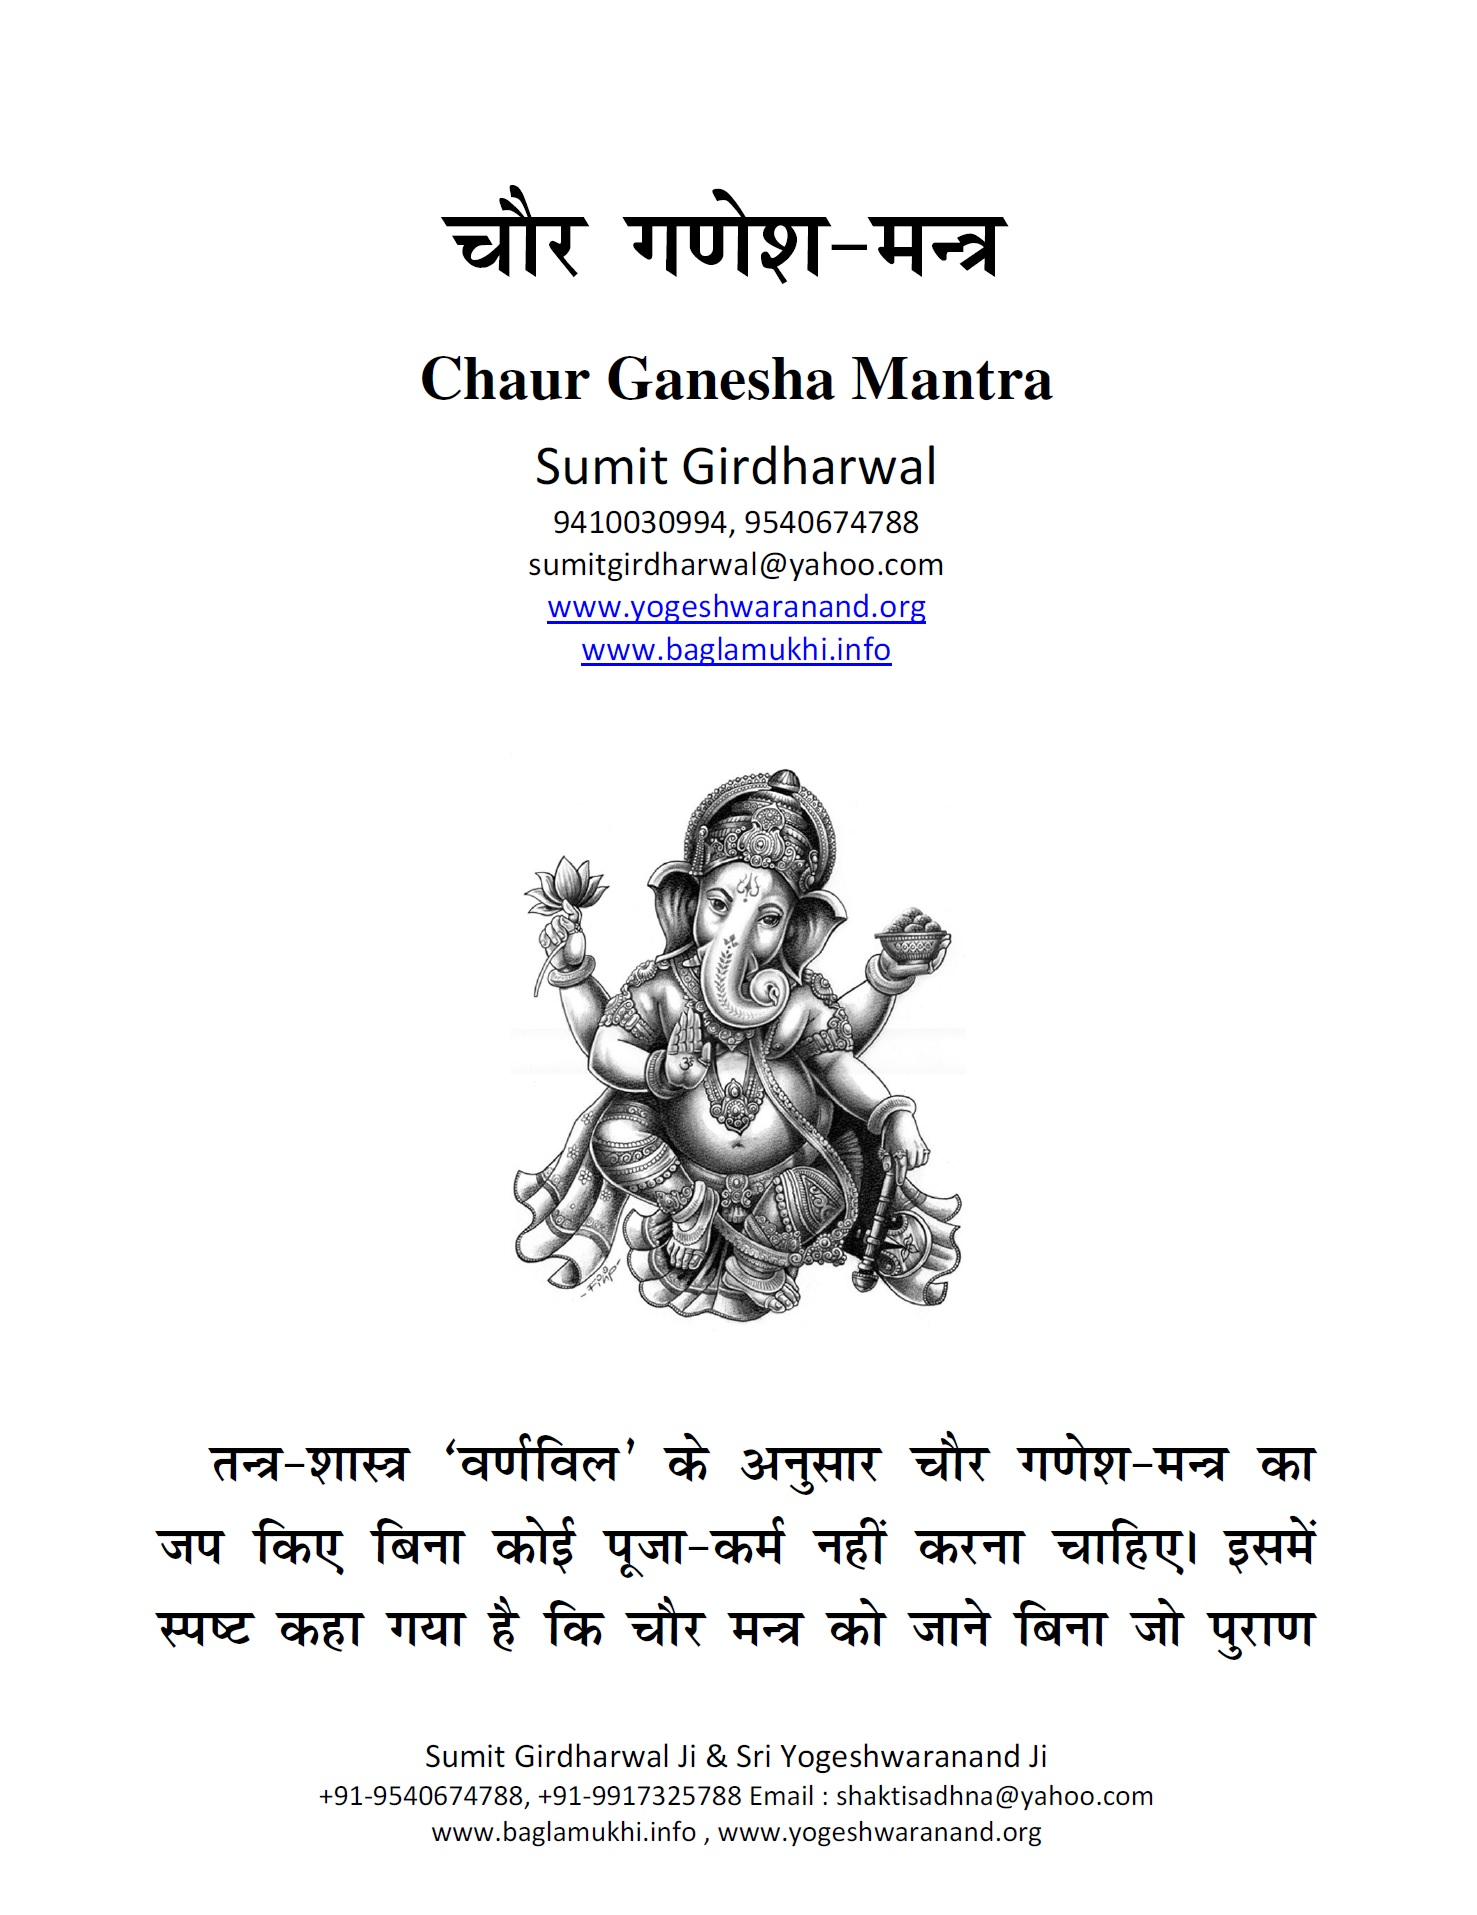 Download Ganesh mantra